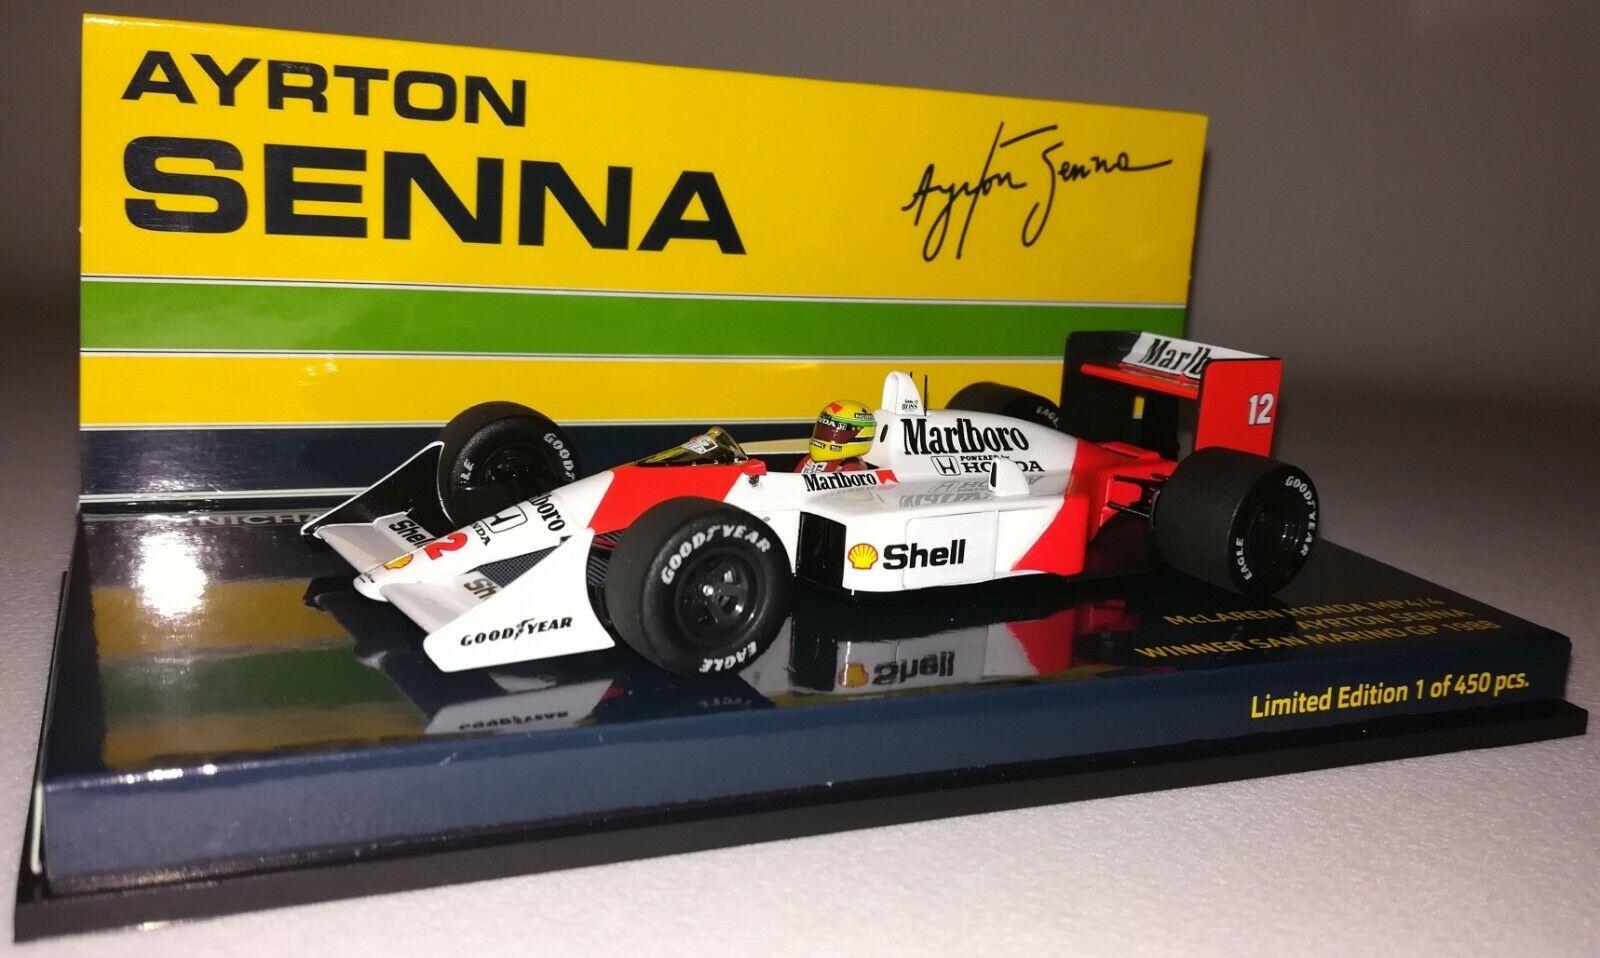 Minichamps McLaren Honda MP4-4 Ayrton Senna 1 43 San Marino GP 1988 'Marlboro'